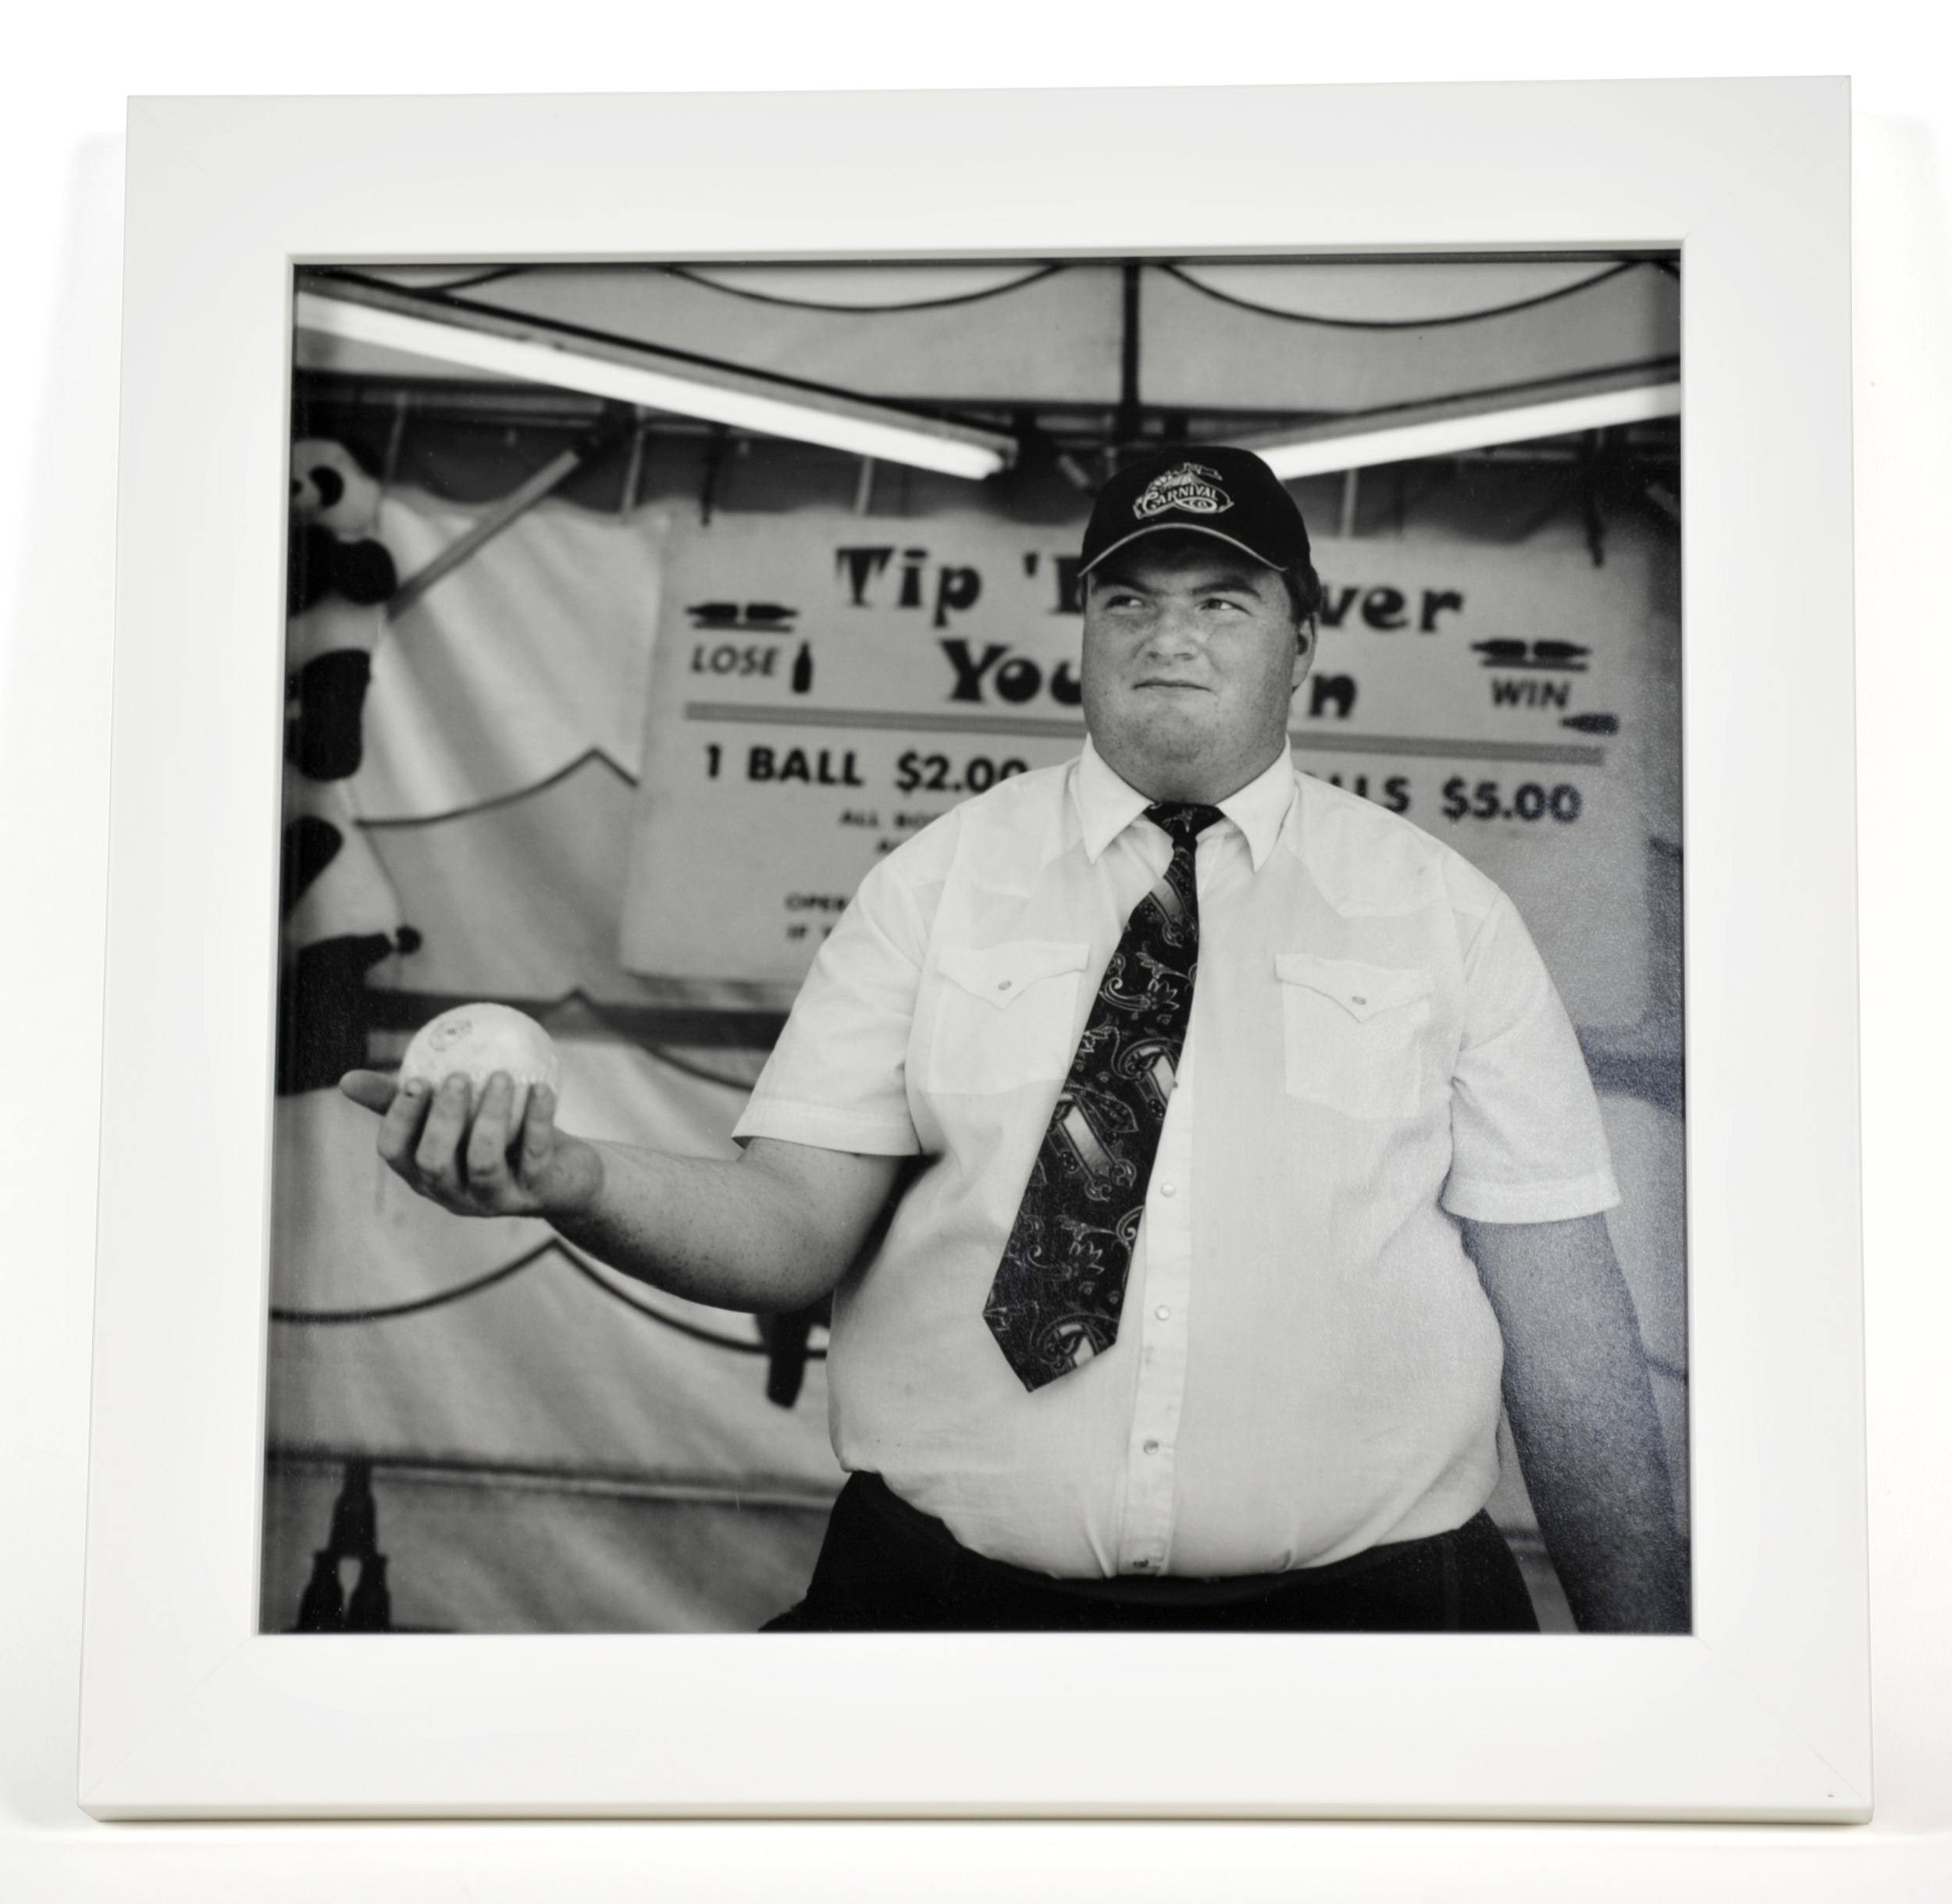 Carlos Rodriguez     Carnival, Othello WA , 2003  Photograph, silver gelatin print